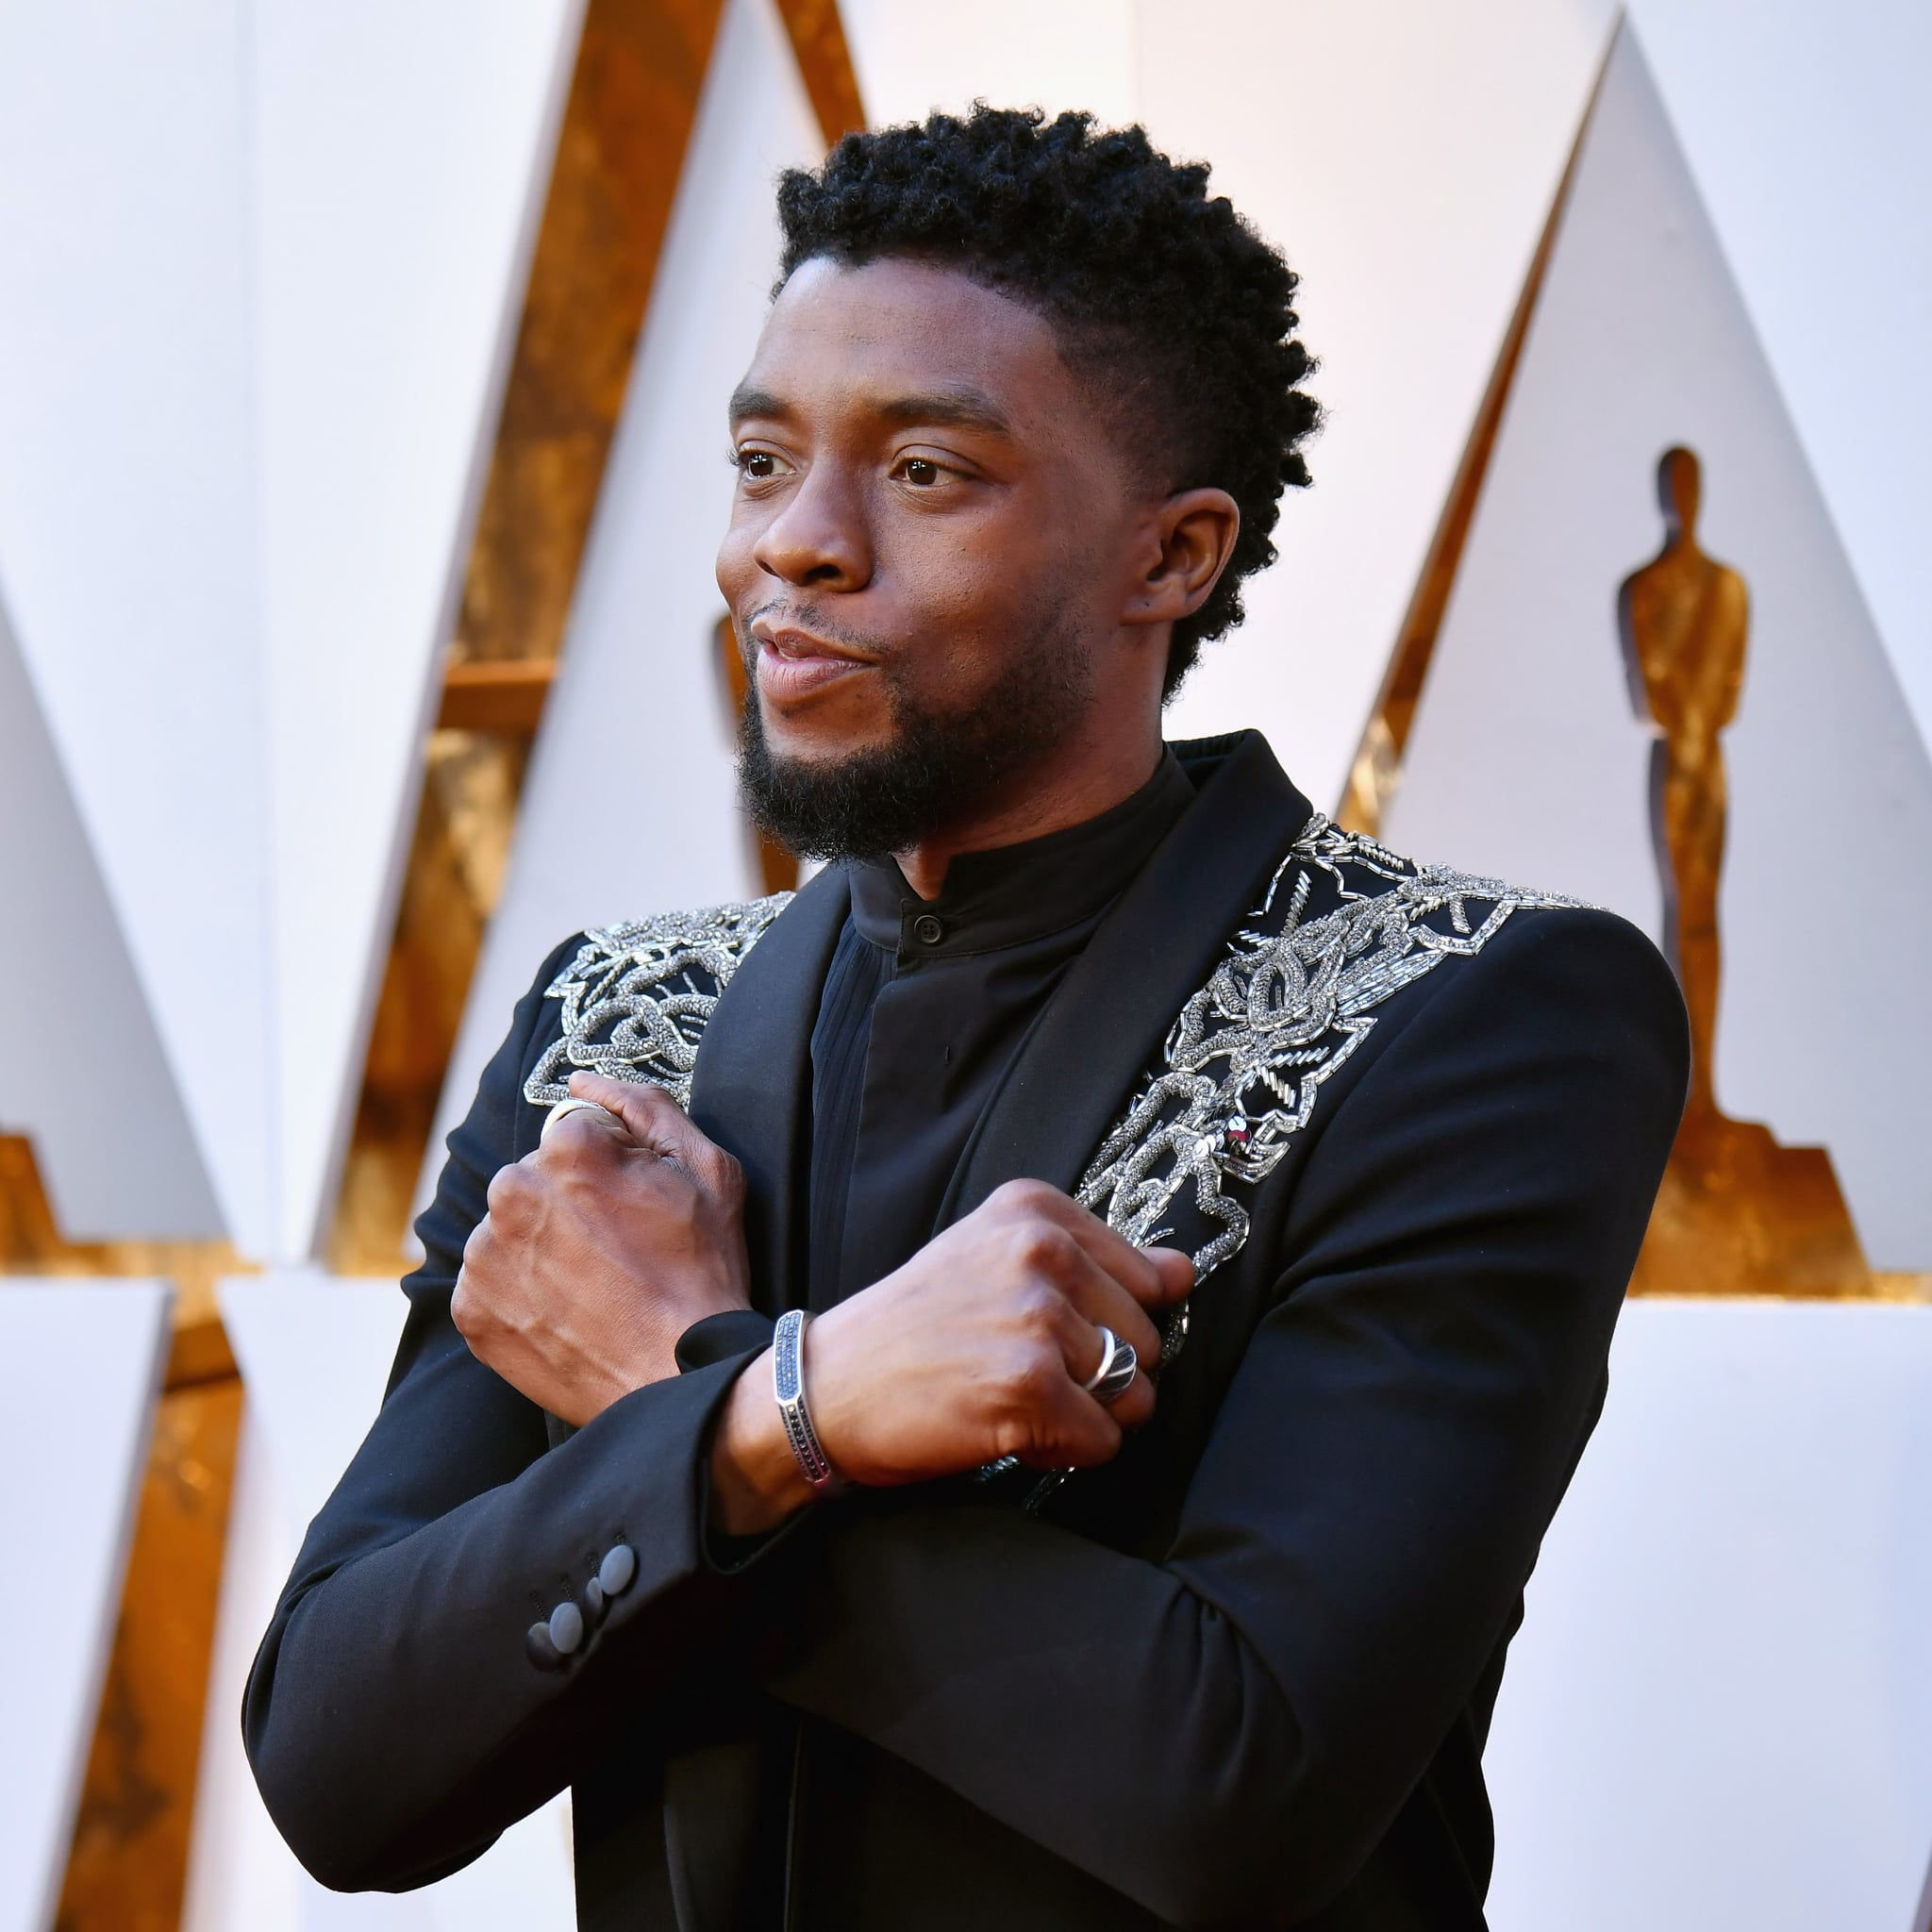 "Chadwick Boseman ""Wakanda Forever"" at the 2018 Oscars | POPSUGAR Celebrity"